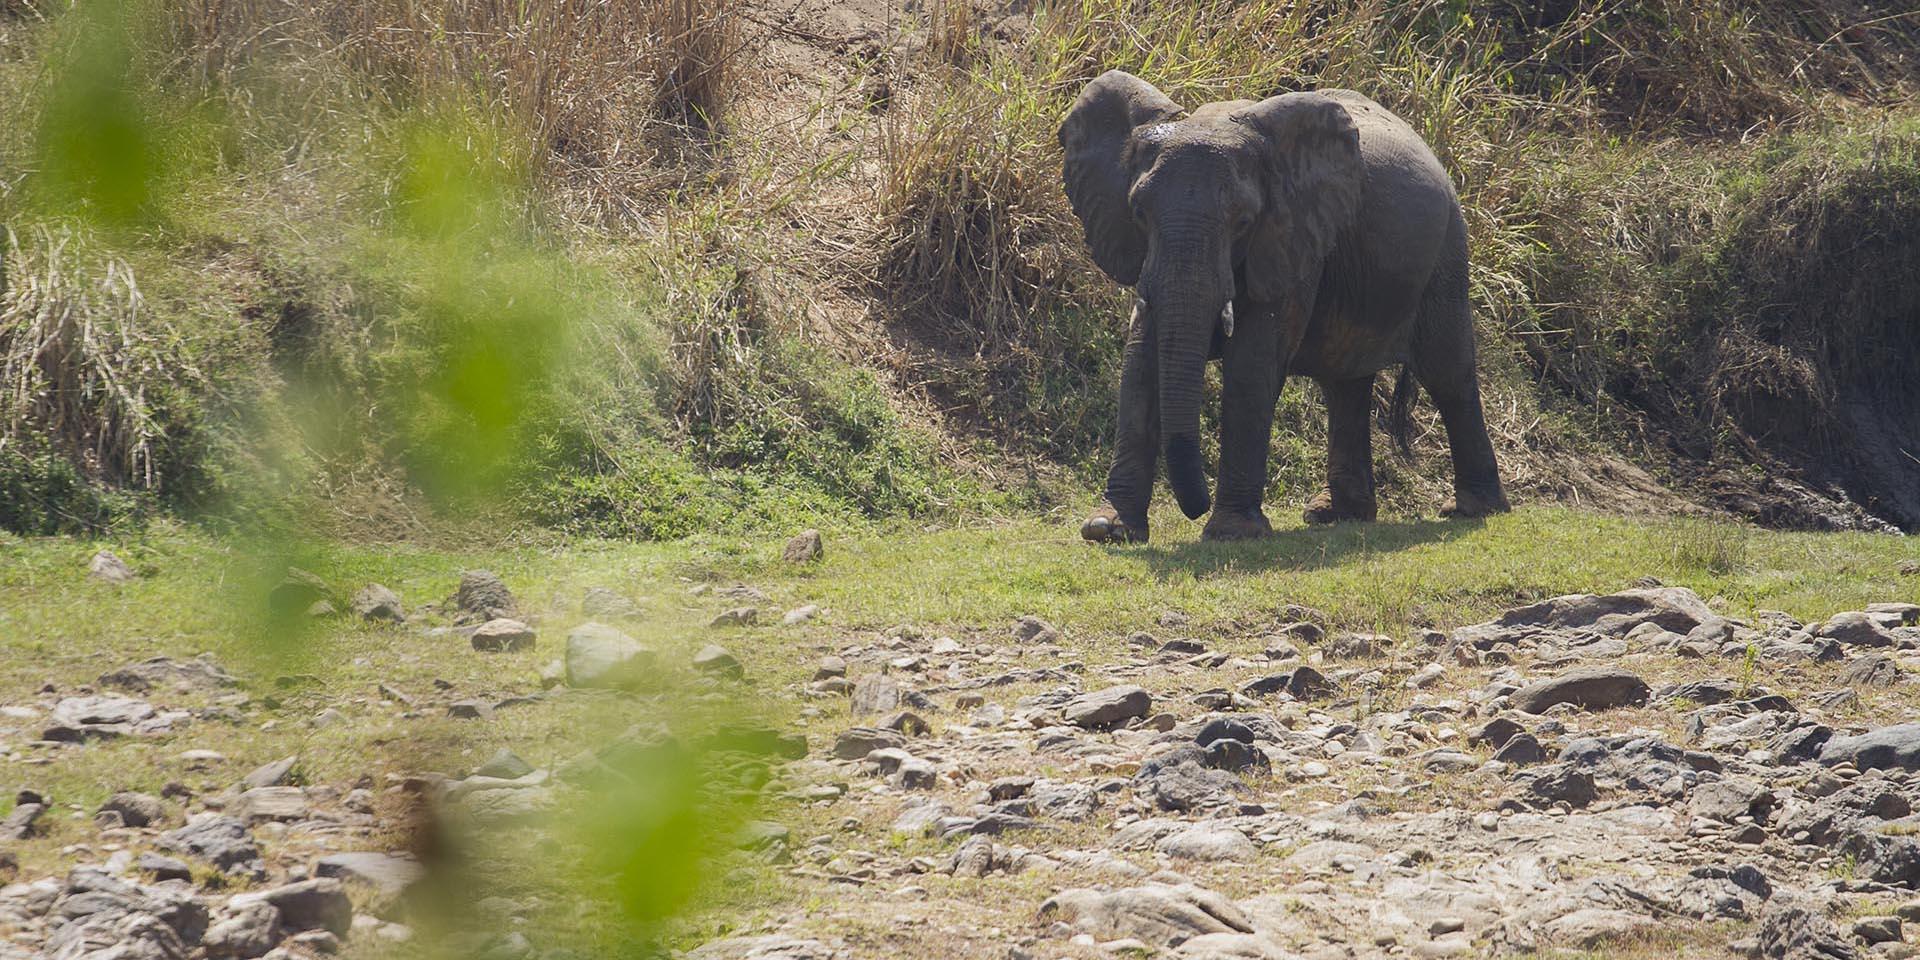 nkhotakota wildlife reserve malawi-national-parks-reserves-malawian-style-malawi-adventures-experiences-specialist-tour-operator-elephant-malawi-safaris-river